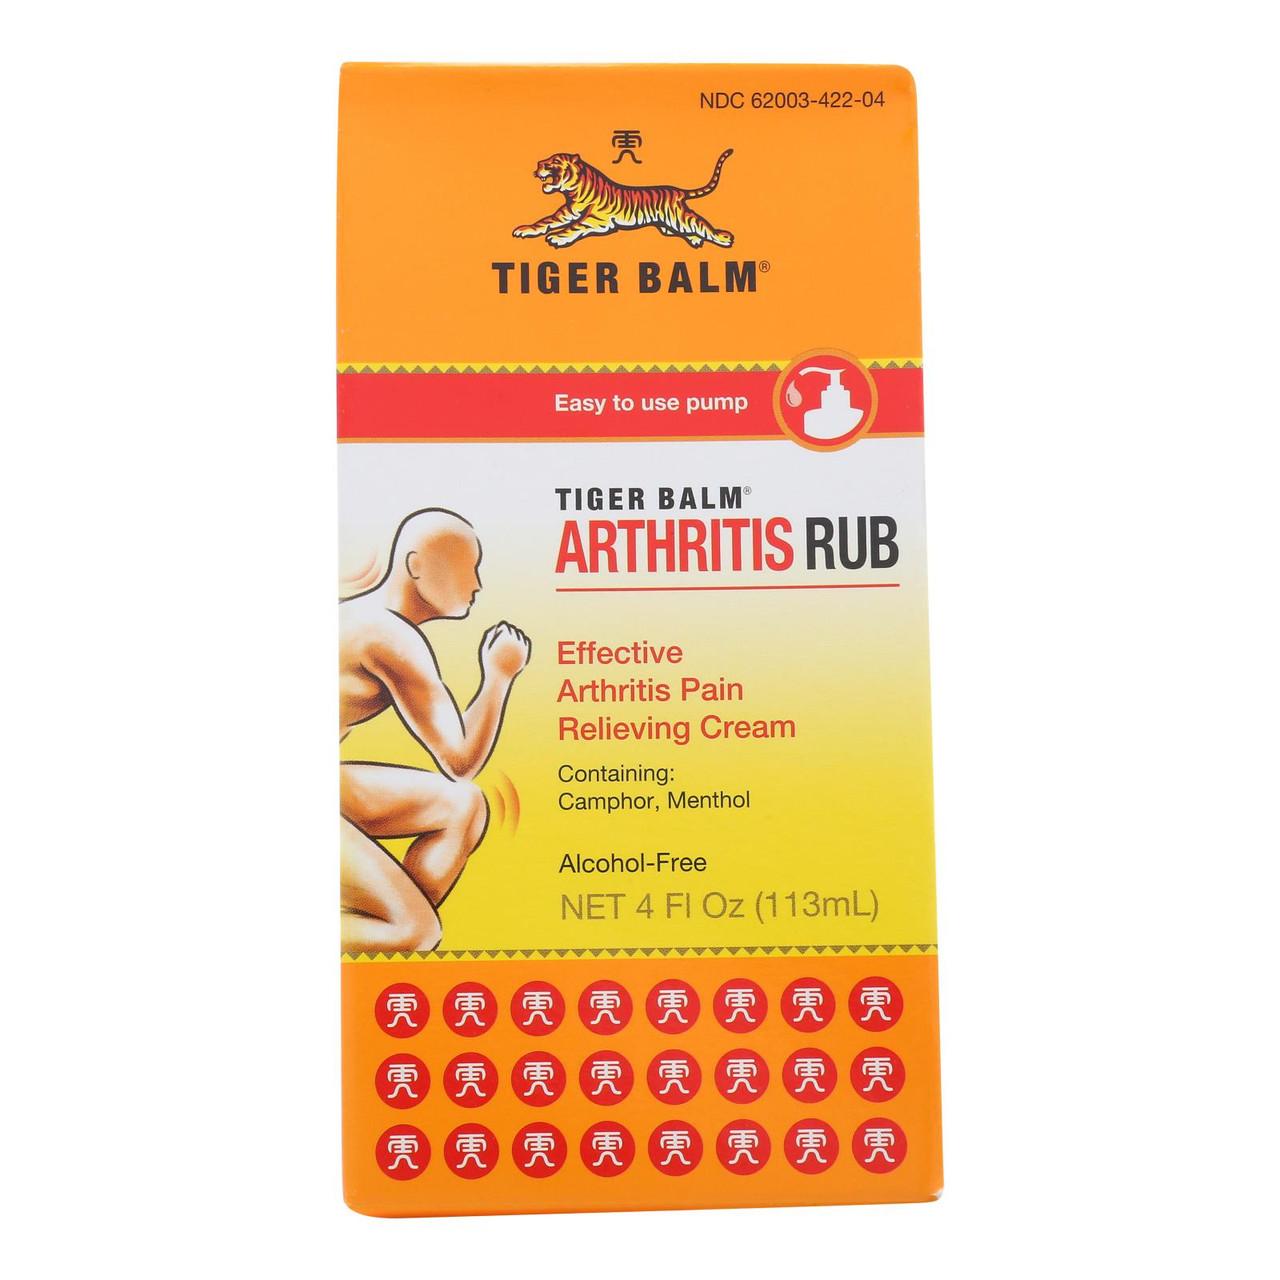 Tiger Balm Arthritis Rub - 4 Fl Oz - The Online Drugstore